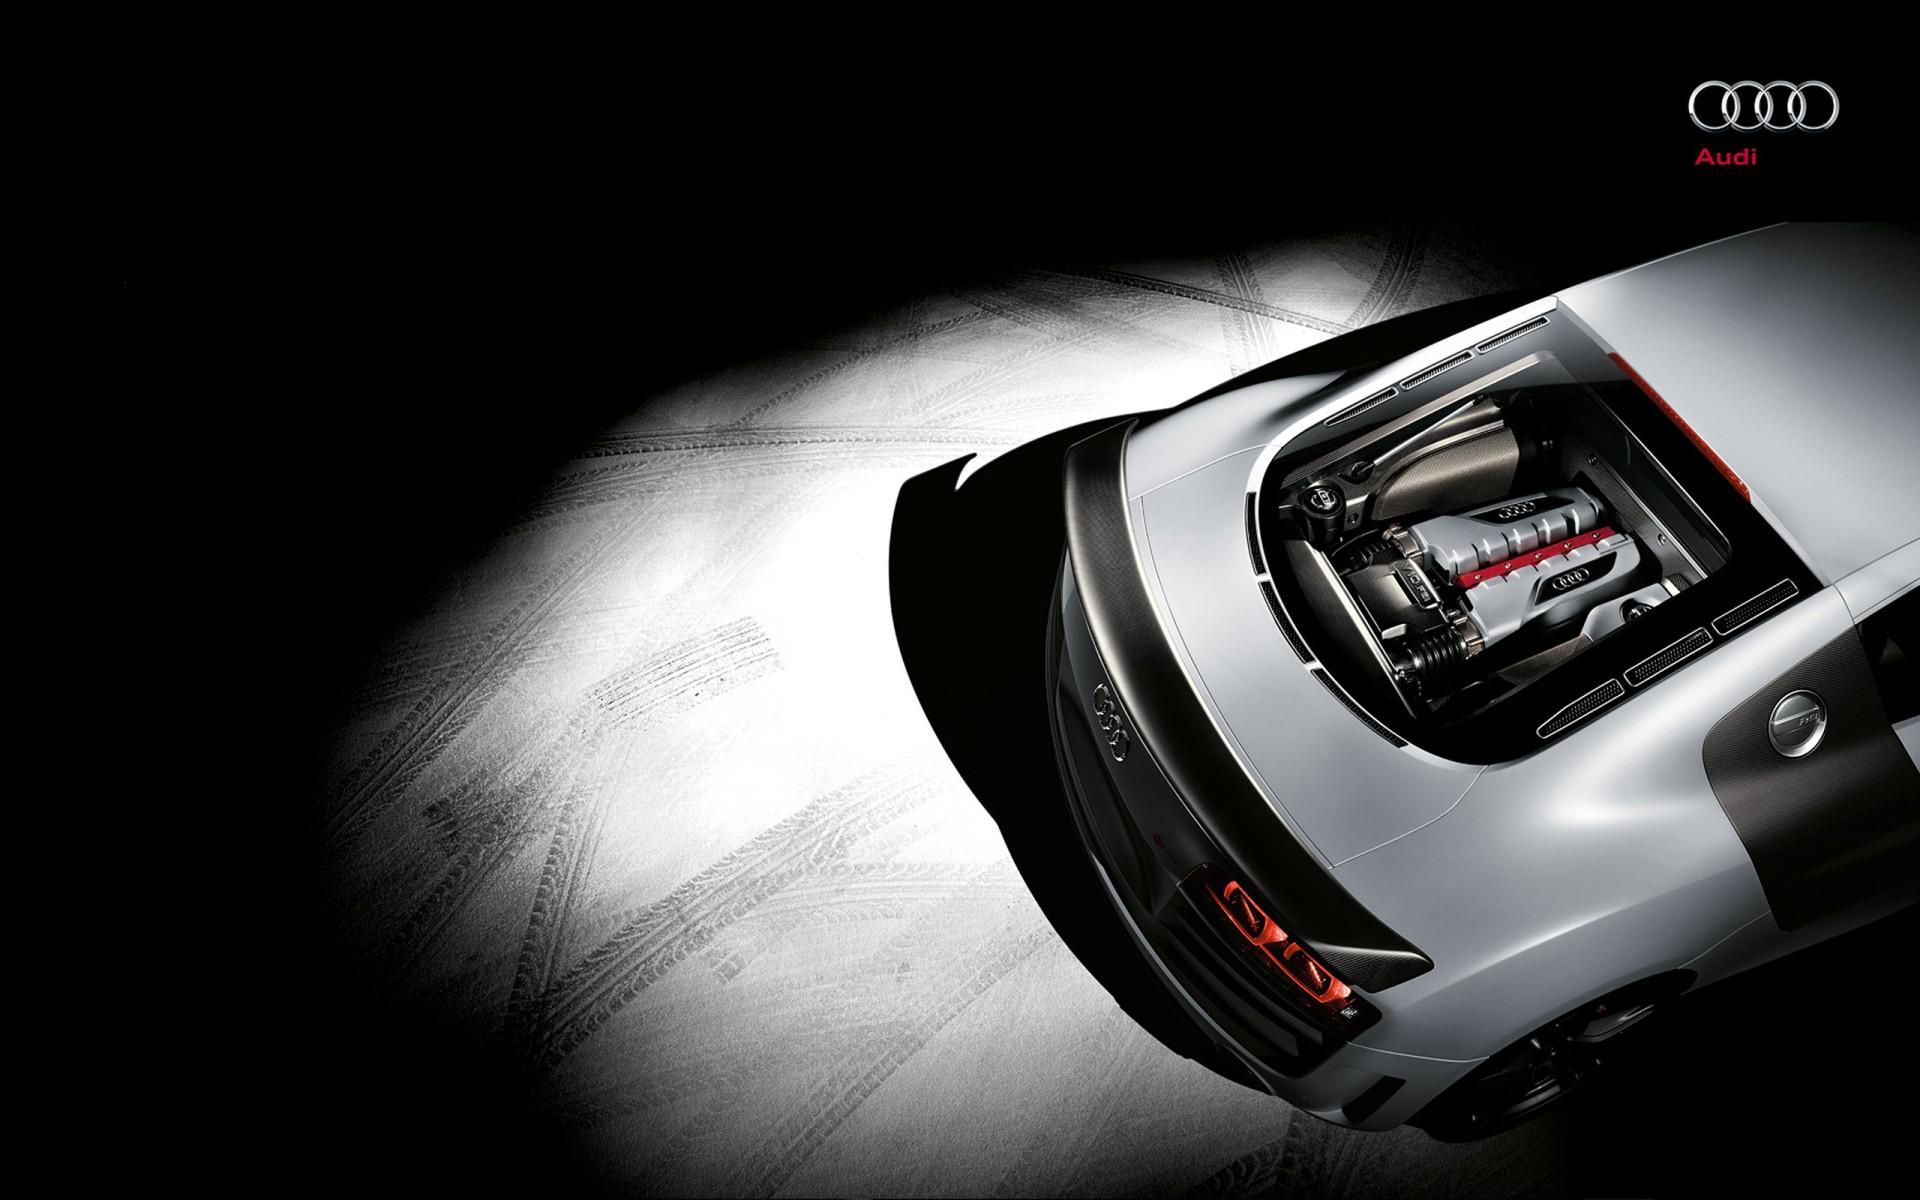 Lamborghini Cars Wallpapers 3d Audi R8 Rear Engine Wallpaper Hd Car Wallpapers Id 2474